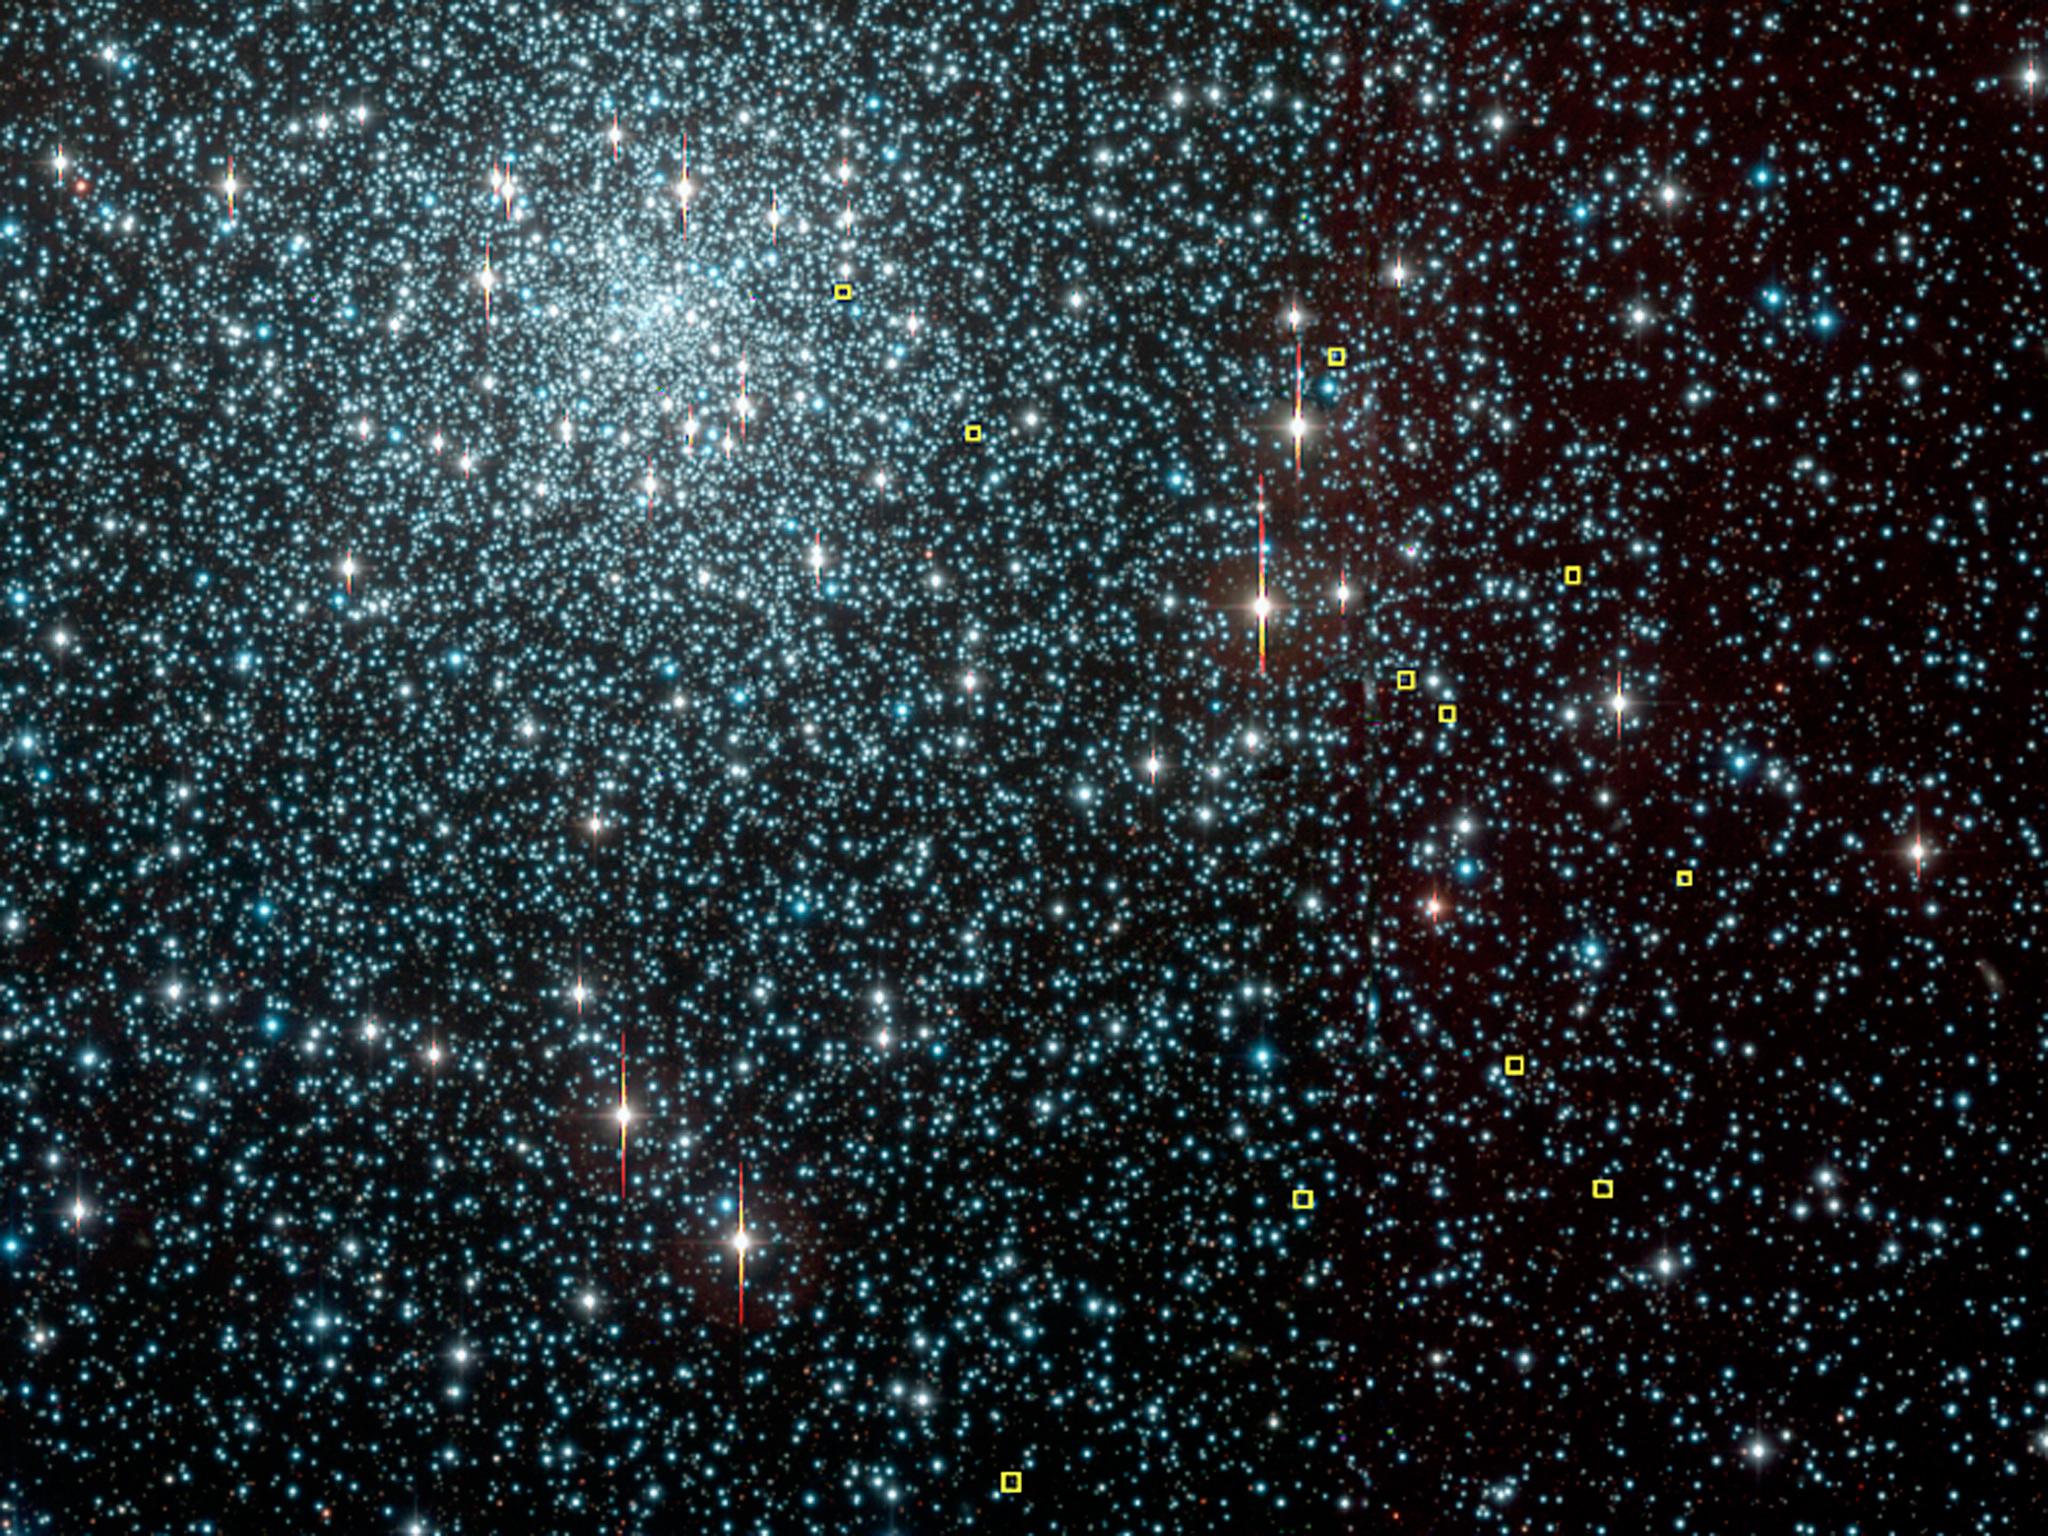 stellar and galactic astronomy uga - HD1280×1280